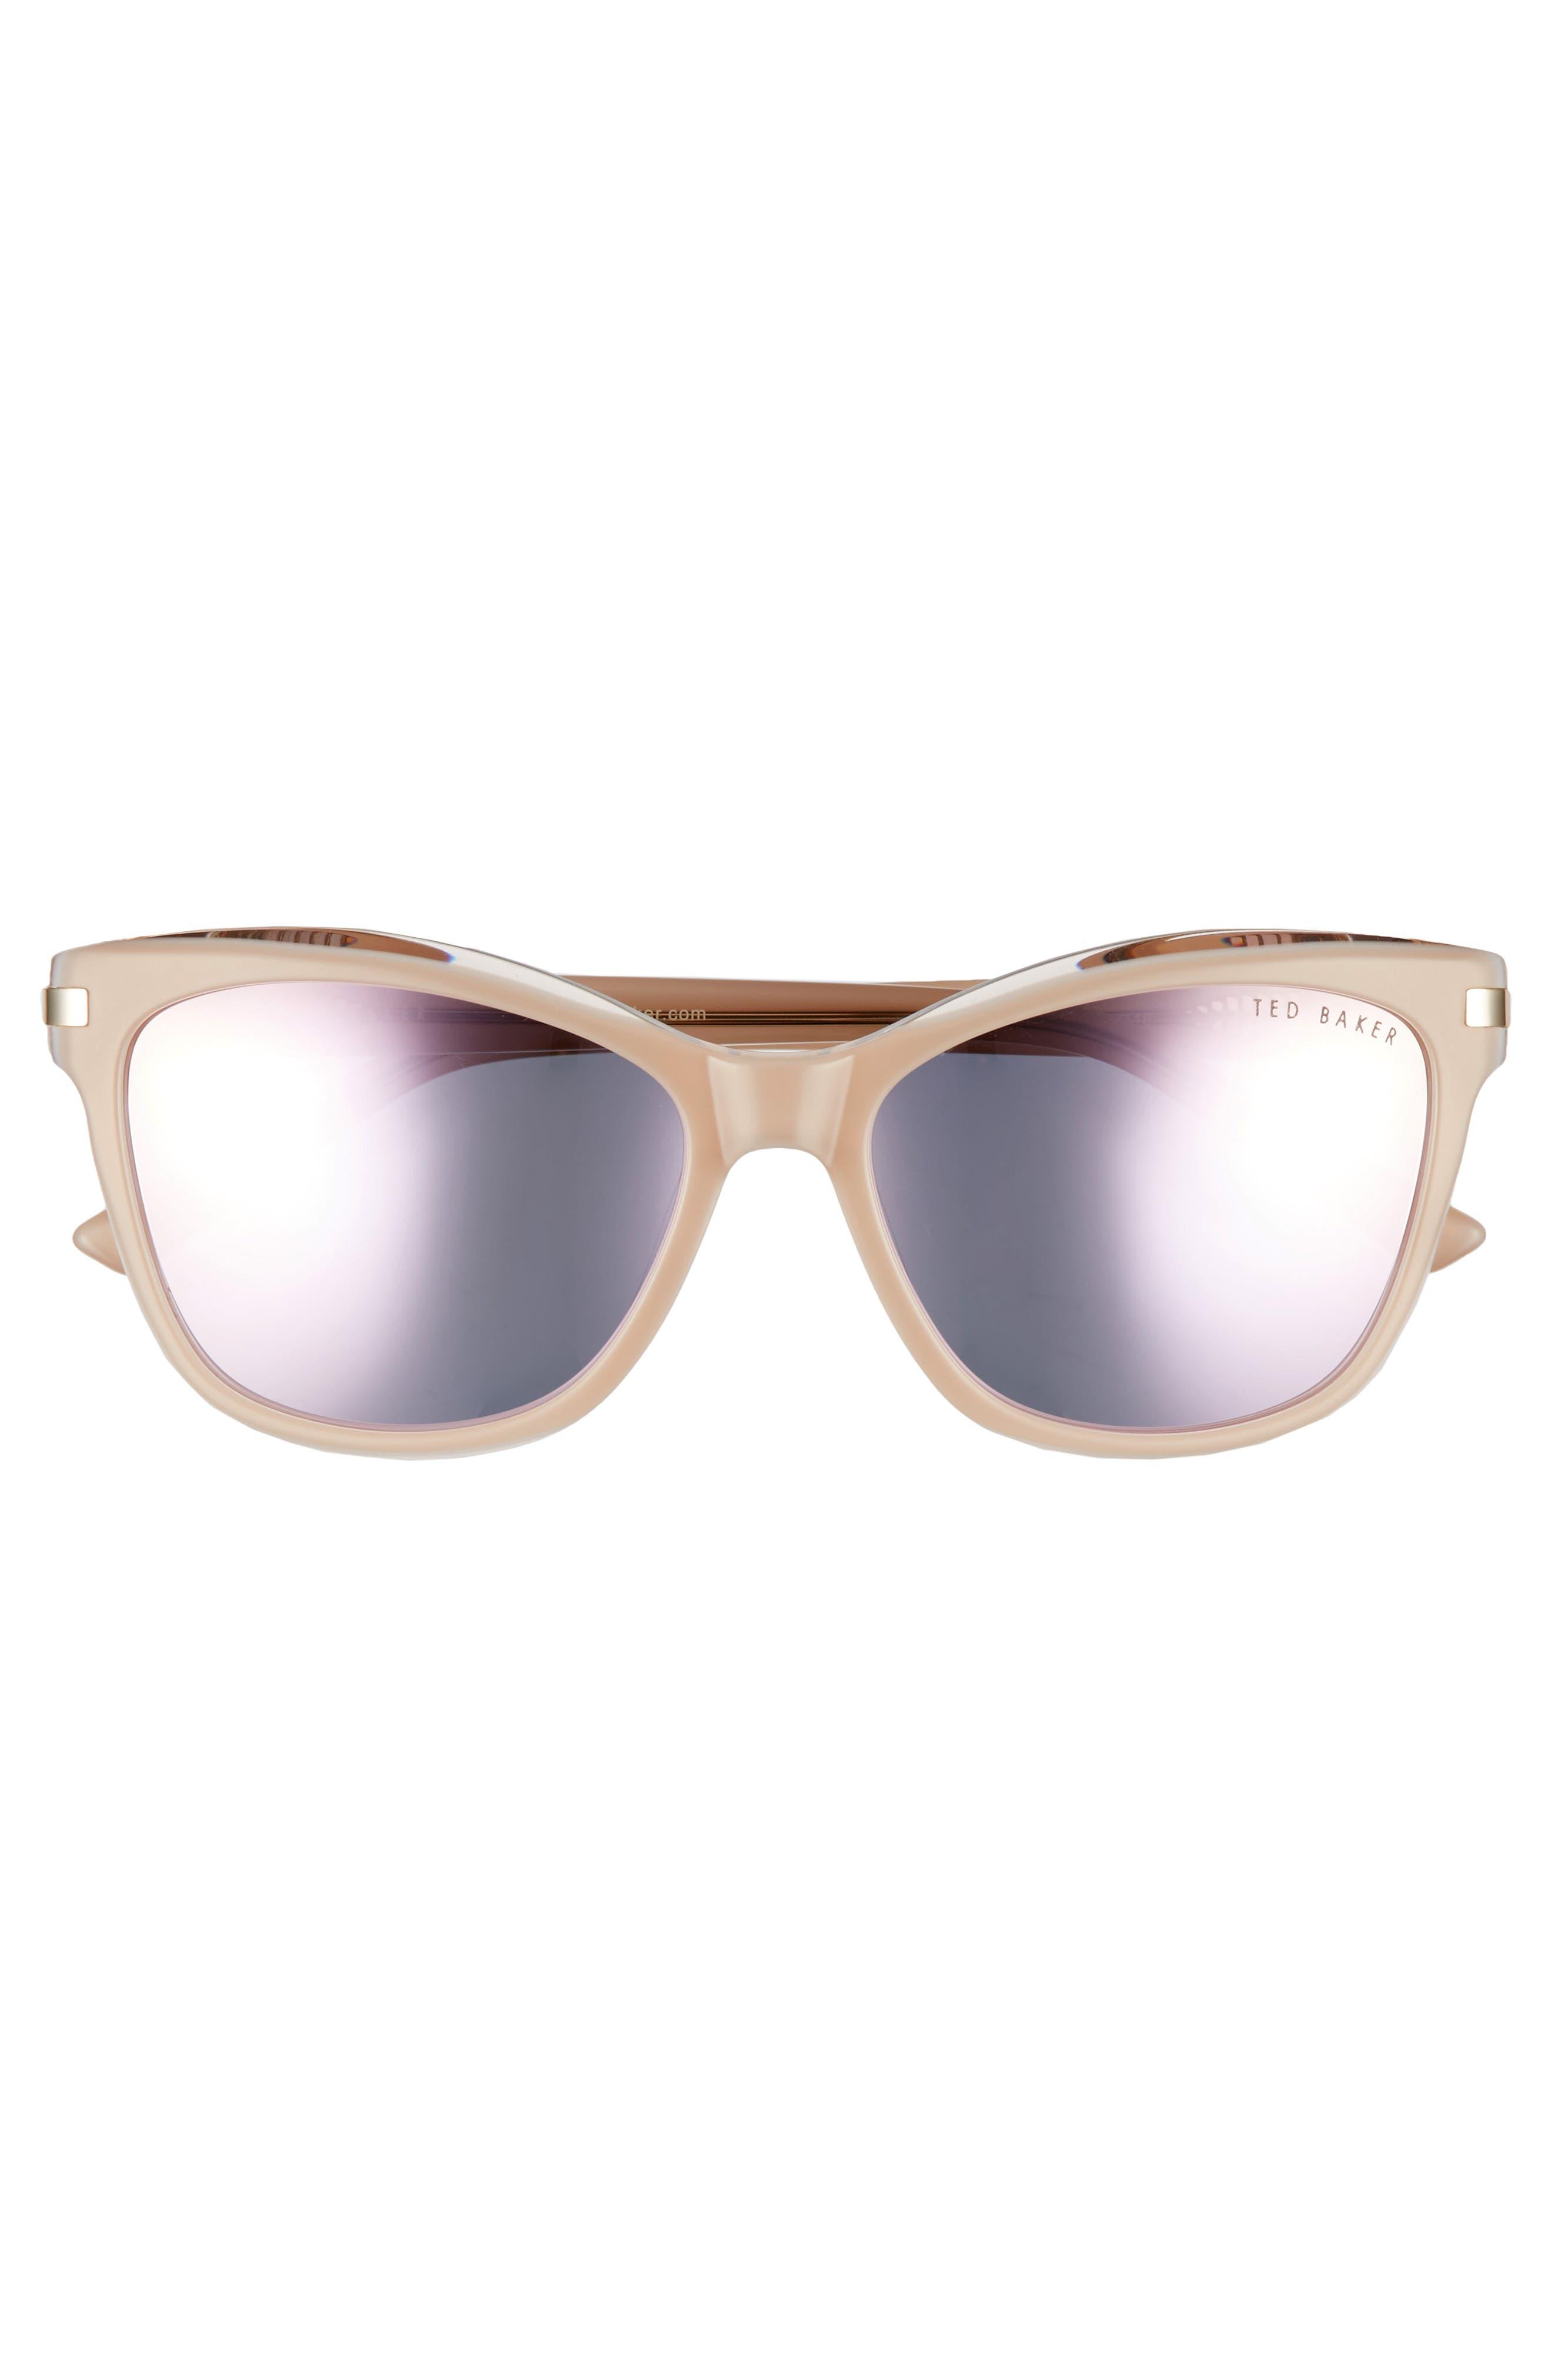 56mm Cat Eye Sunglasses,                             Alternate thumbnail 3, color,                             BLUSH